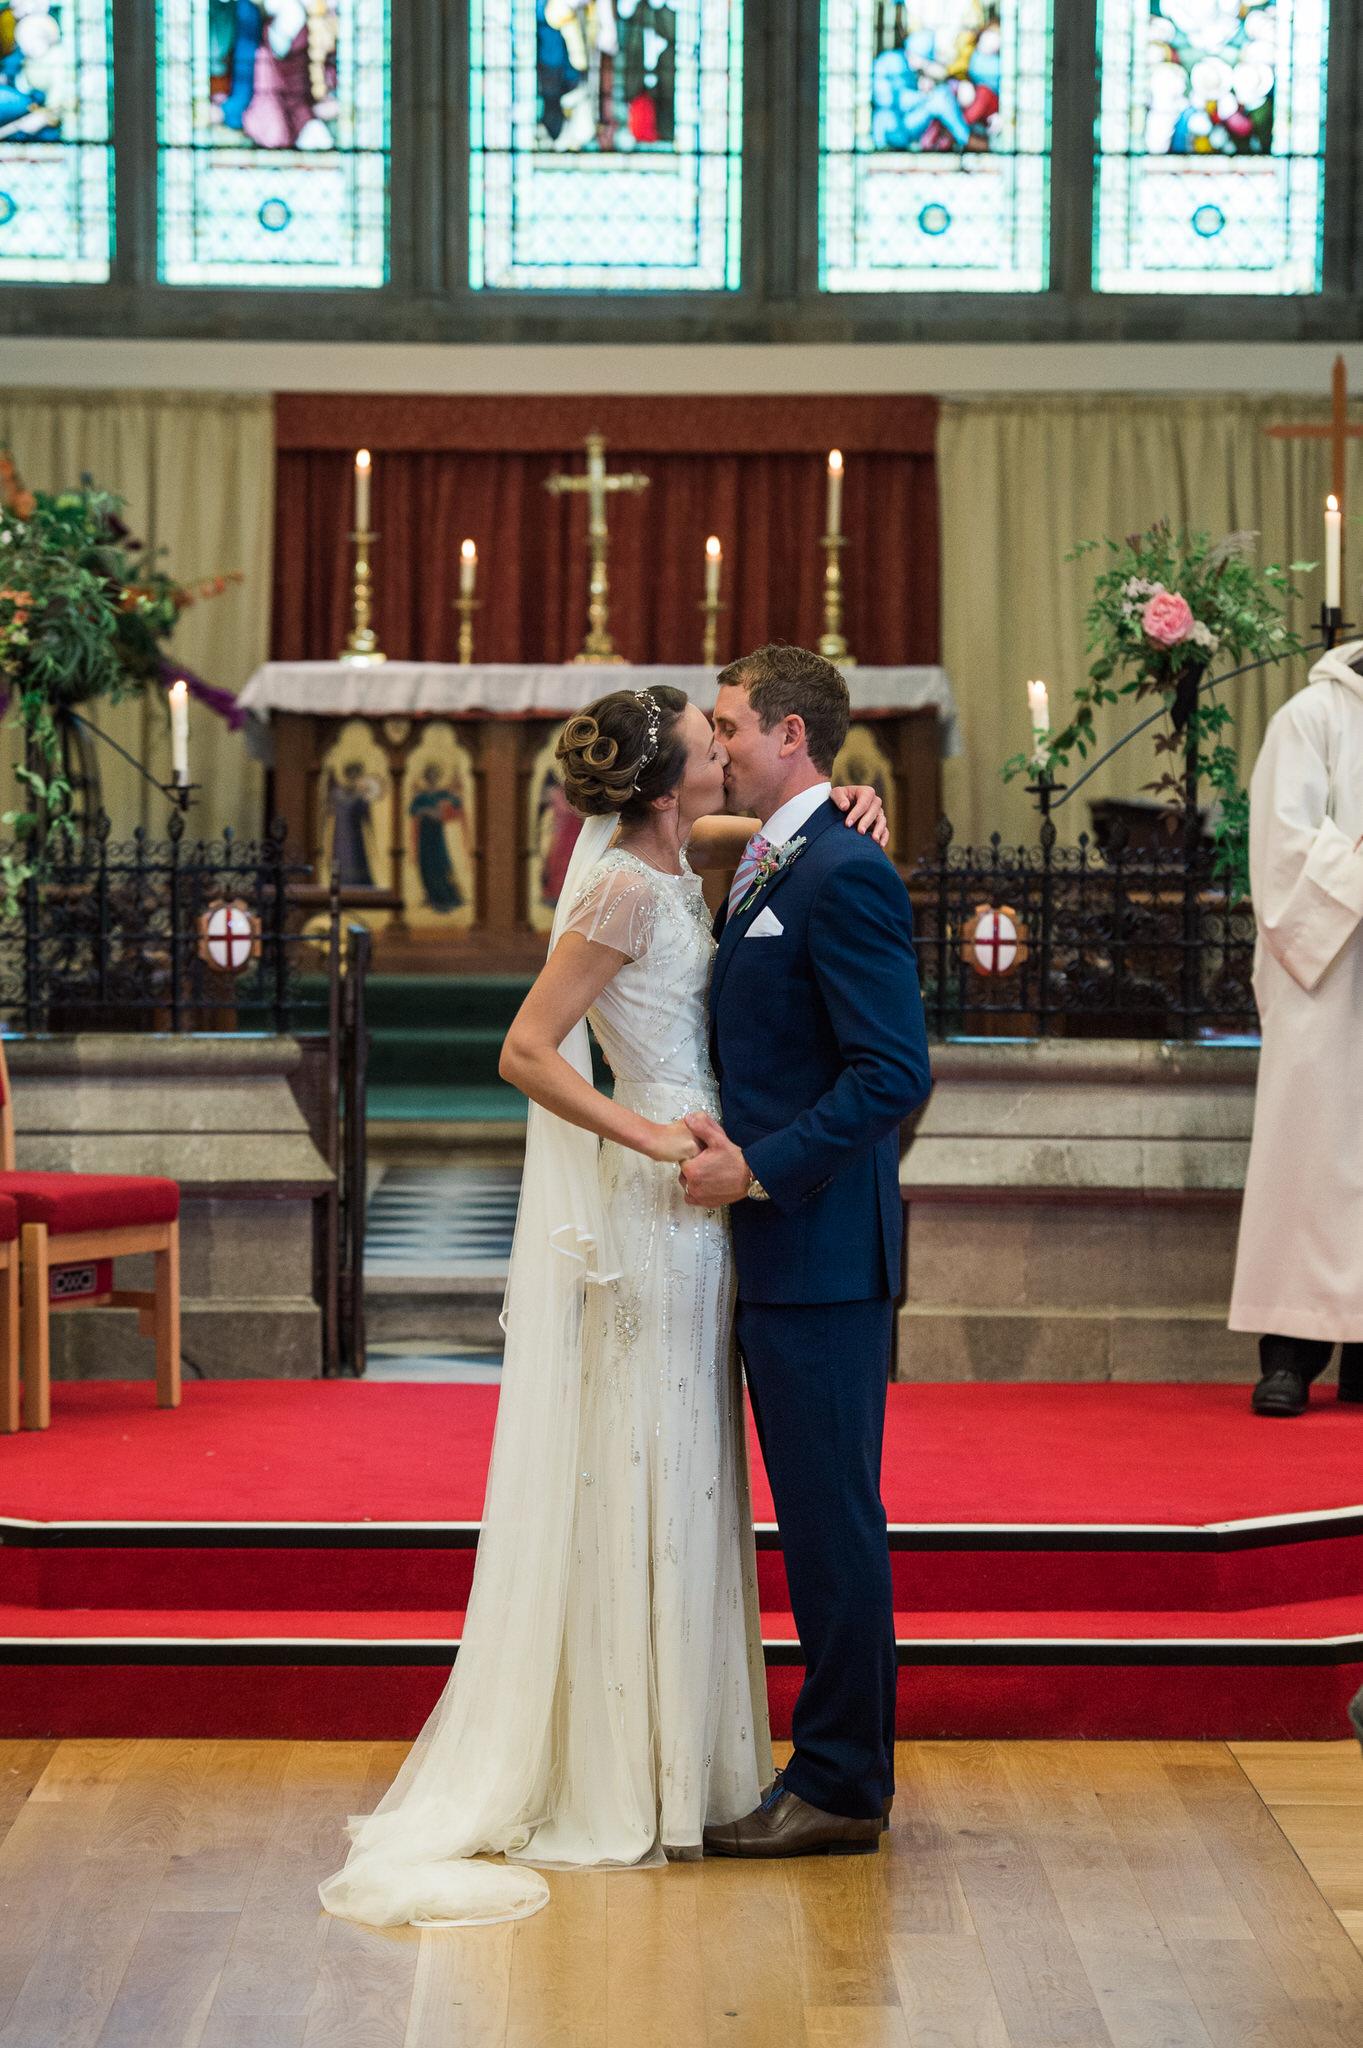 Salcombe devon marquee wedding by simon biffen photography 15